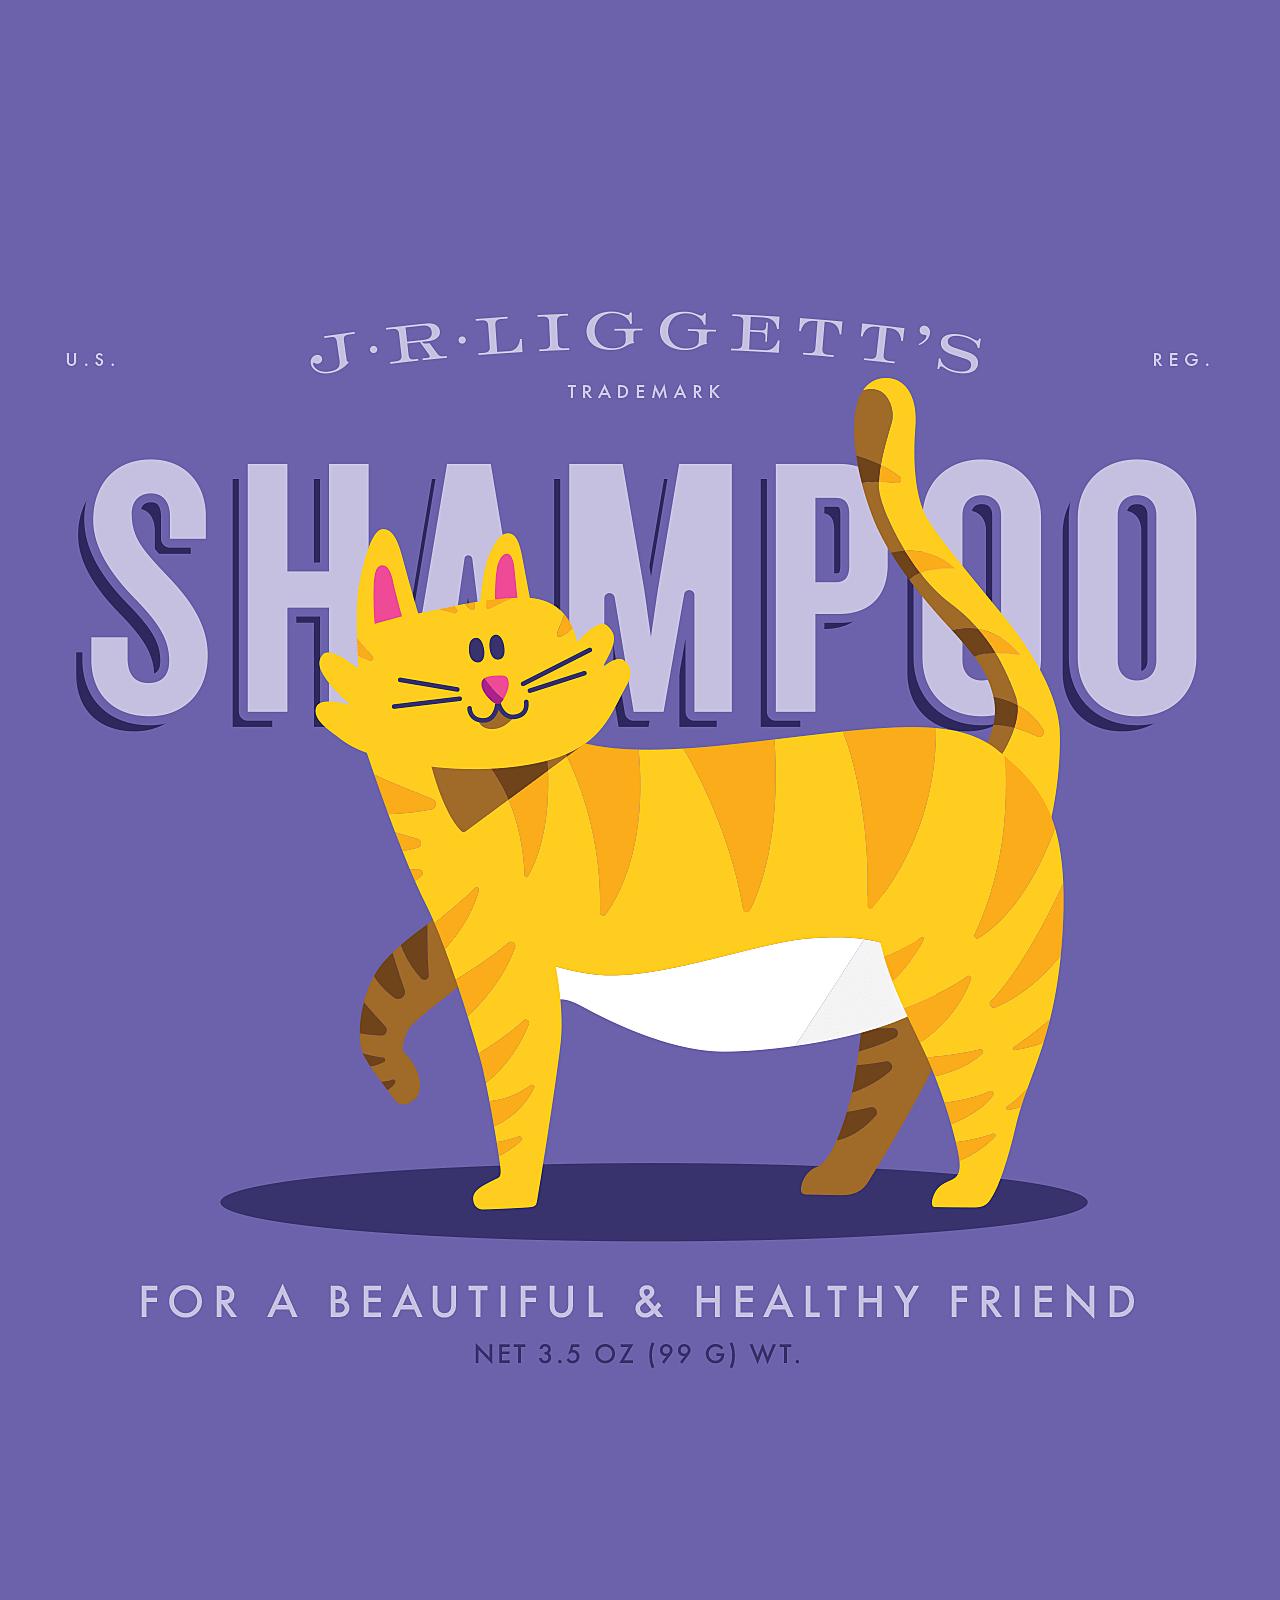 J.R. Liggett's Pet Shampoo